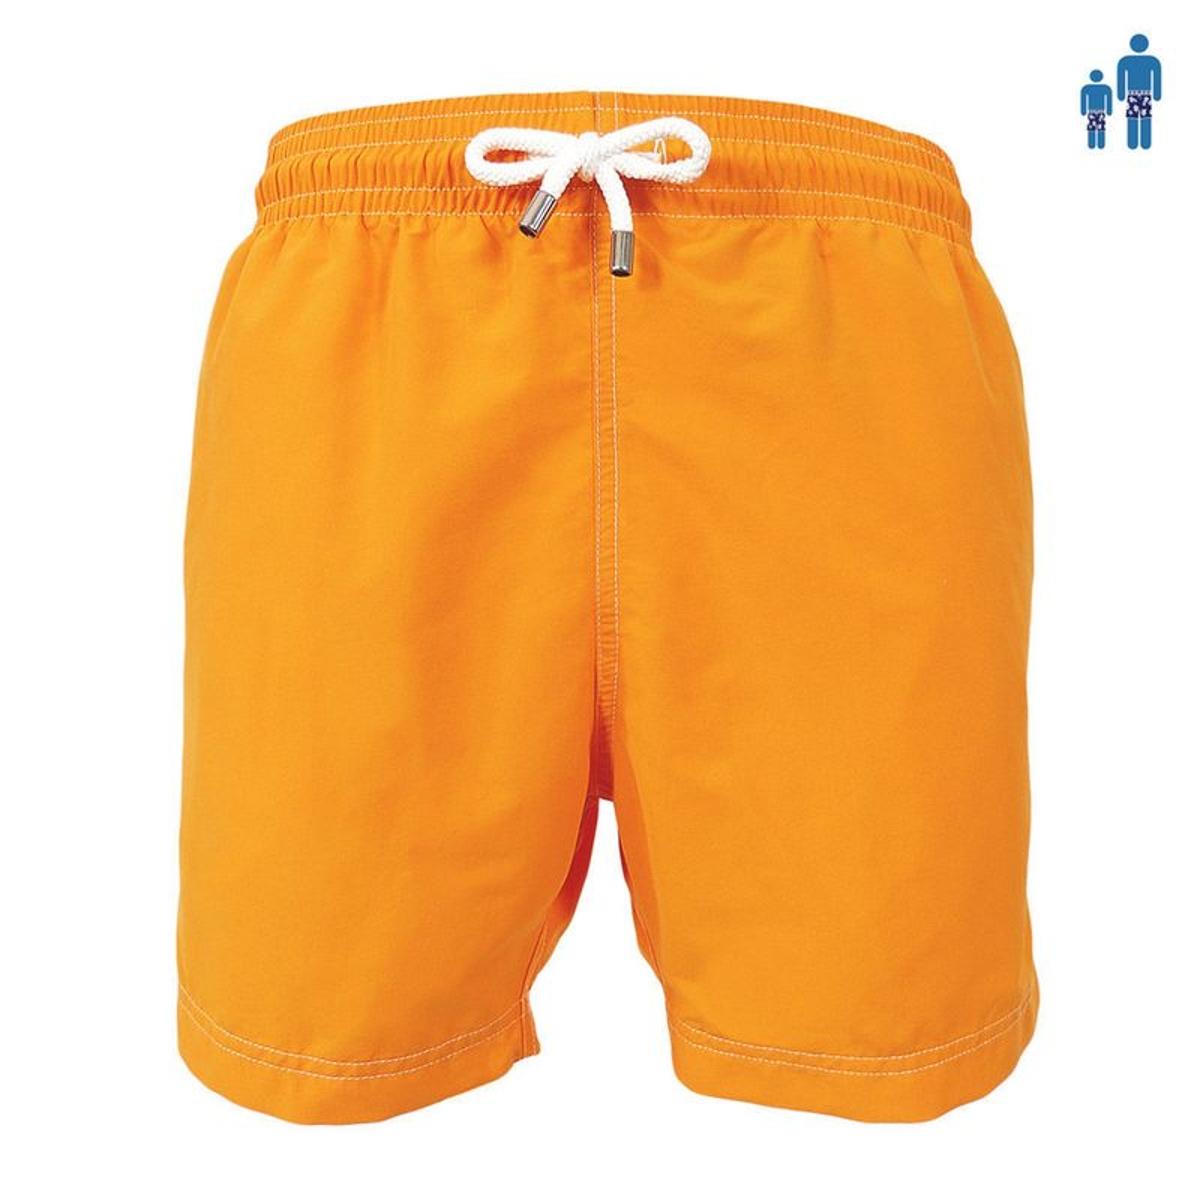 Maillot Short de bain homme Jules uni Mango orange